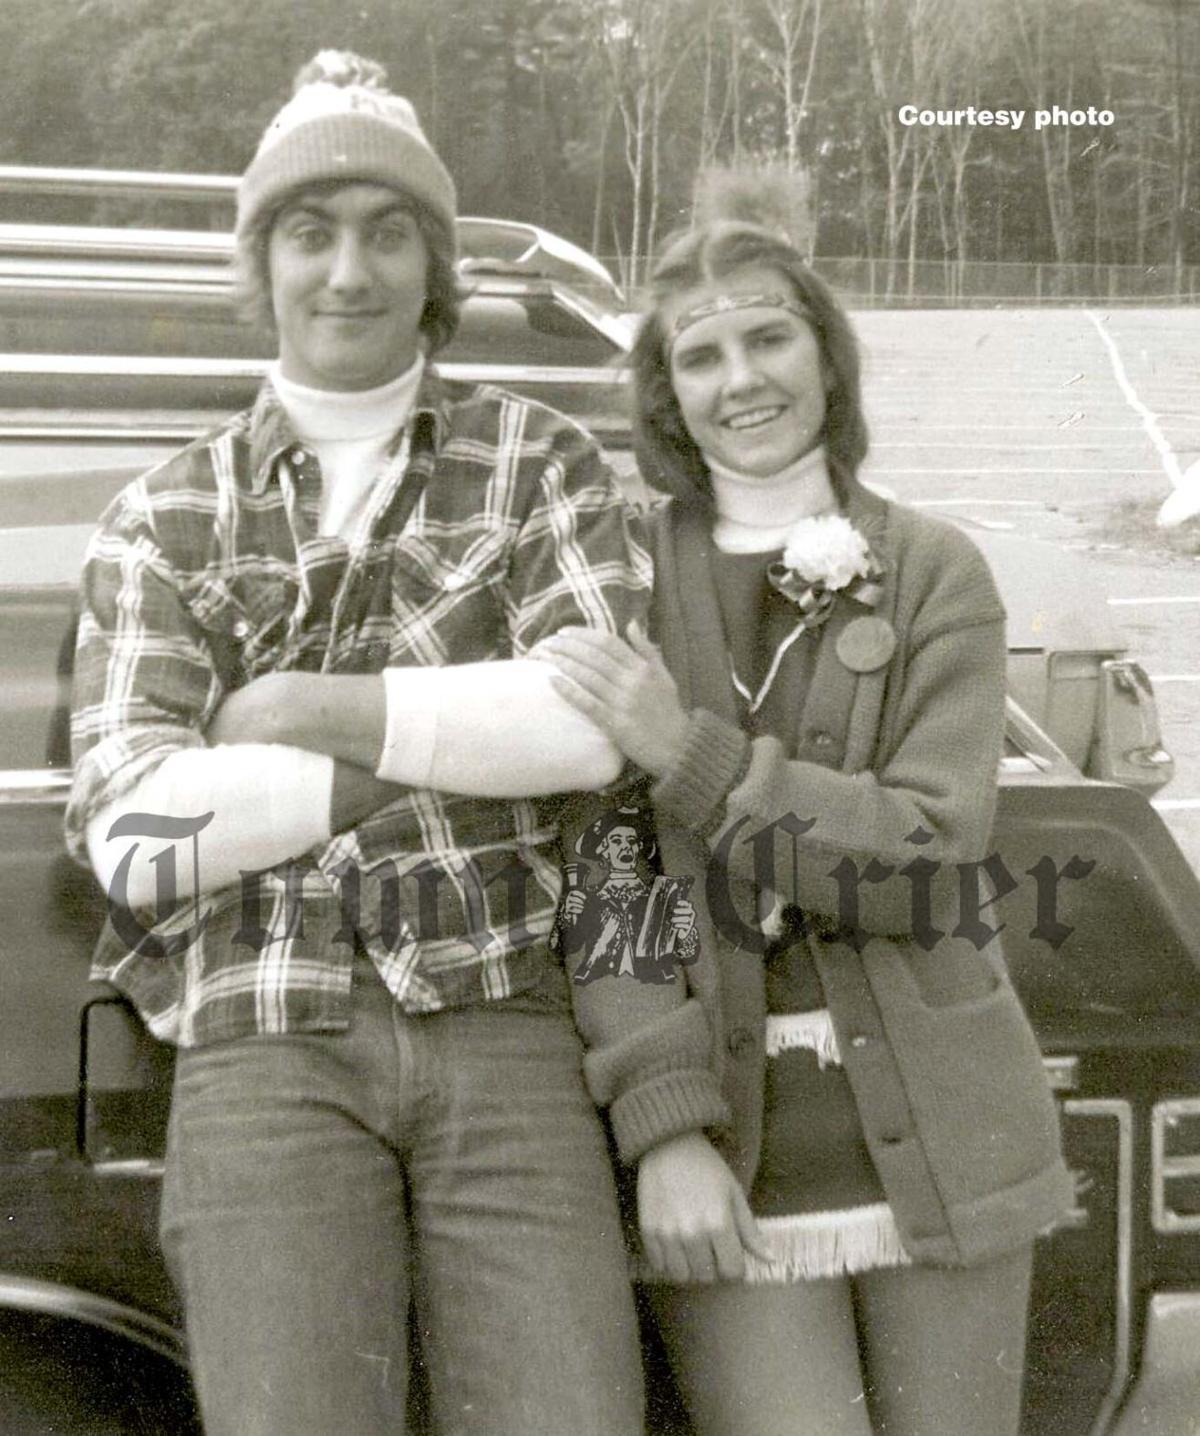 Mark and Diane as high school sweethearts at Tewksbury High School